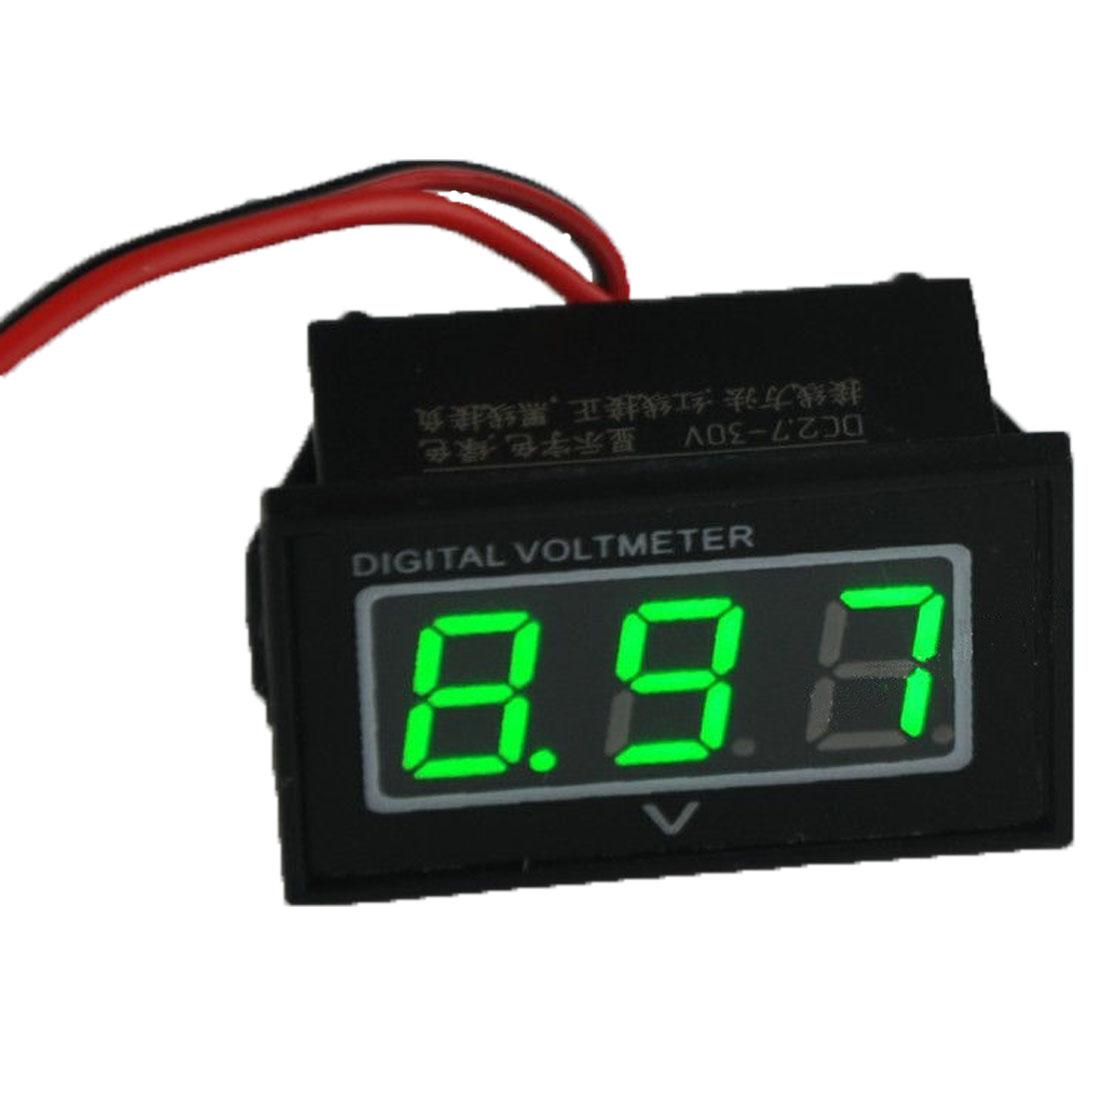 High Quality Green LED Waterproof Monitor 12 Volt Battery Meter 2.7-30V DC Auto Gauge Digital Voltmeter(China (Mainland))